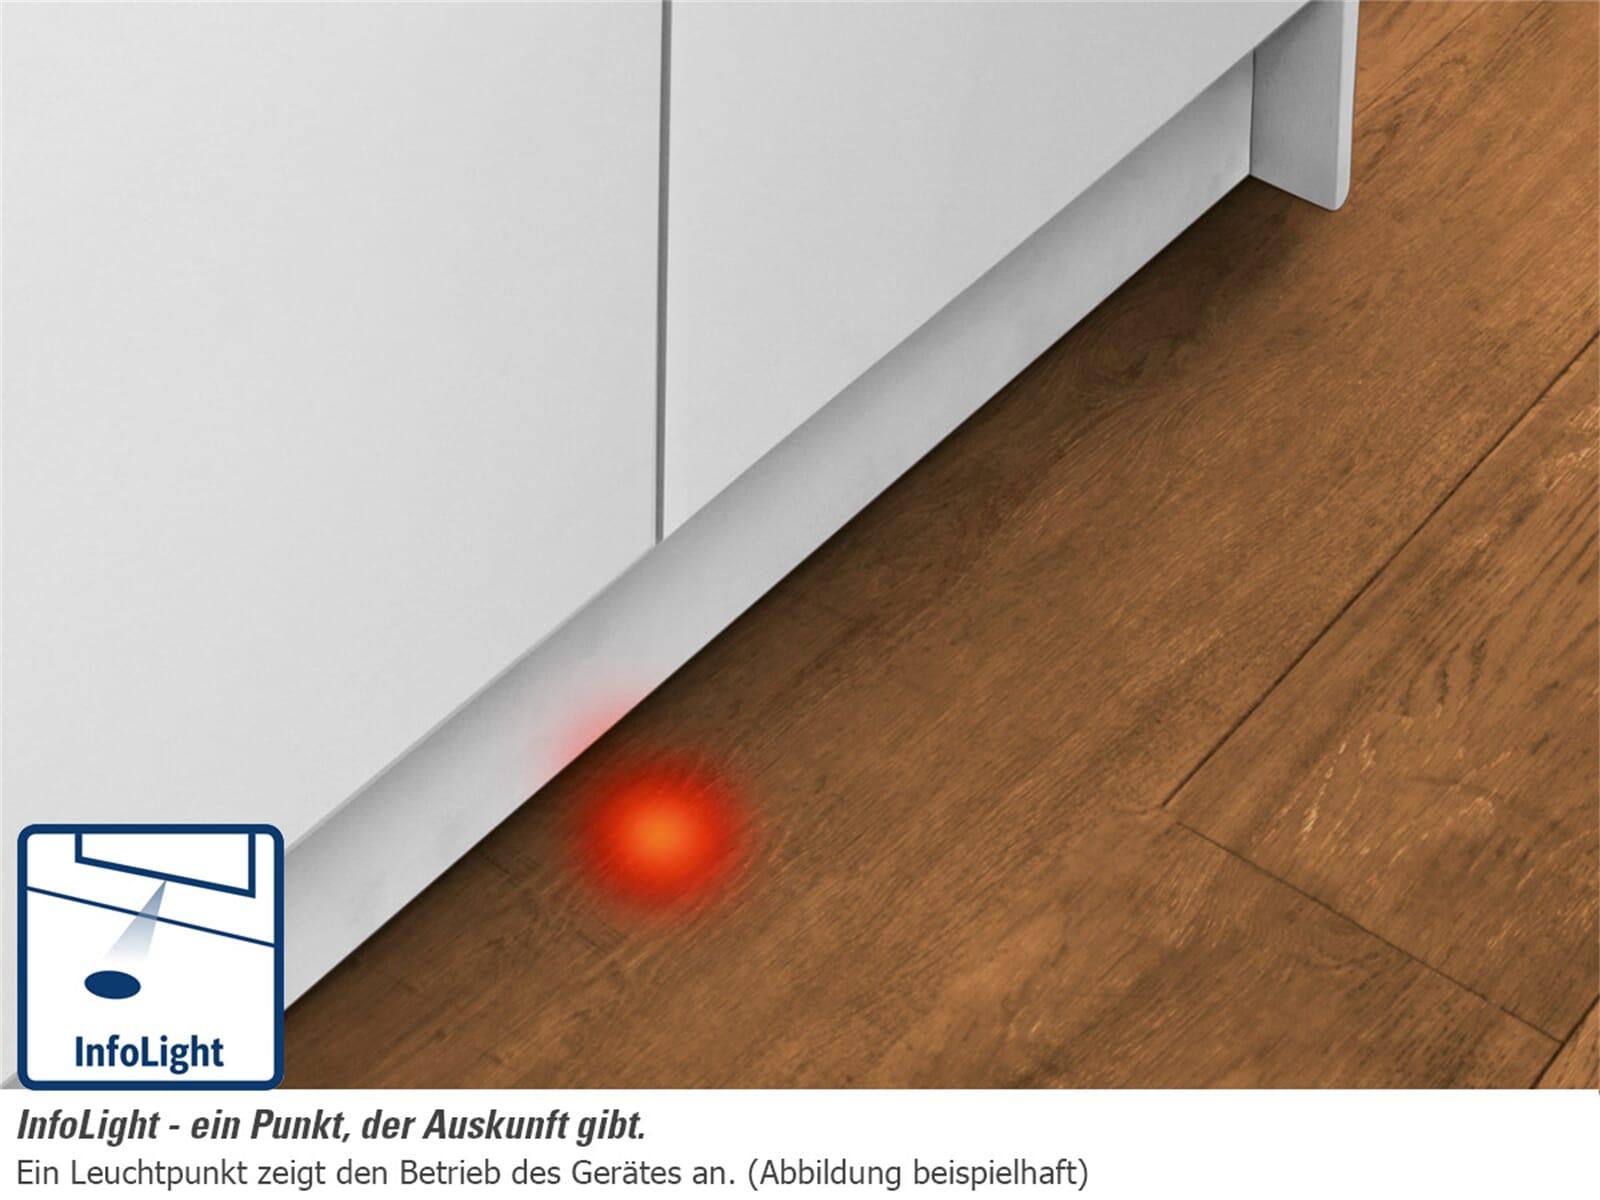 bosch smv53m70eu vollintegrierbarer einbau geschirrsp ler ebay. Black Bedroom Furniture Sets. Home Design Ideas